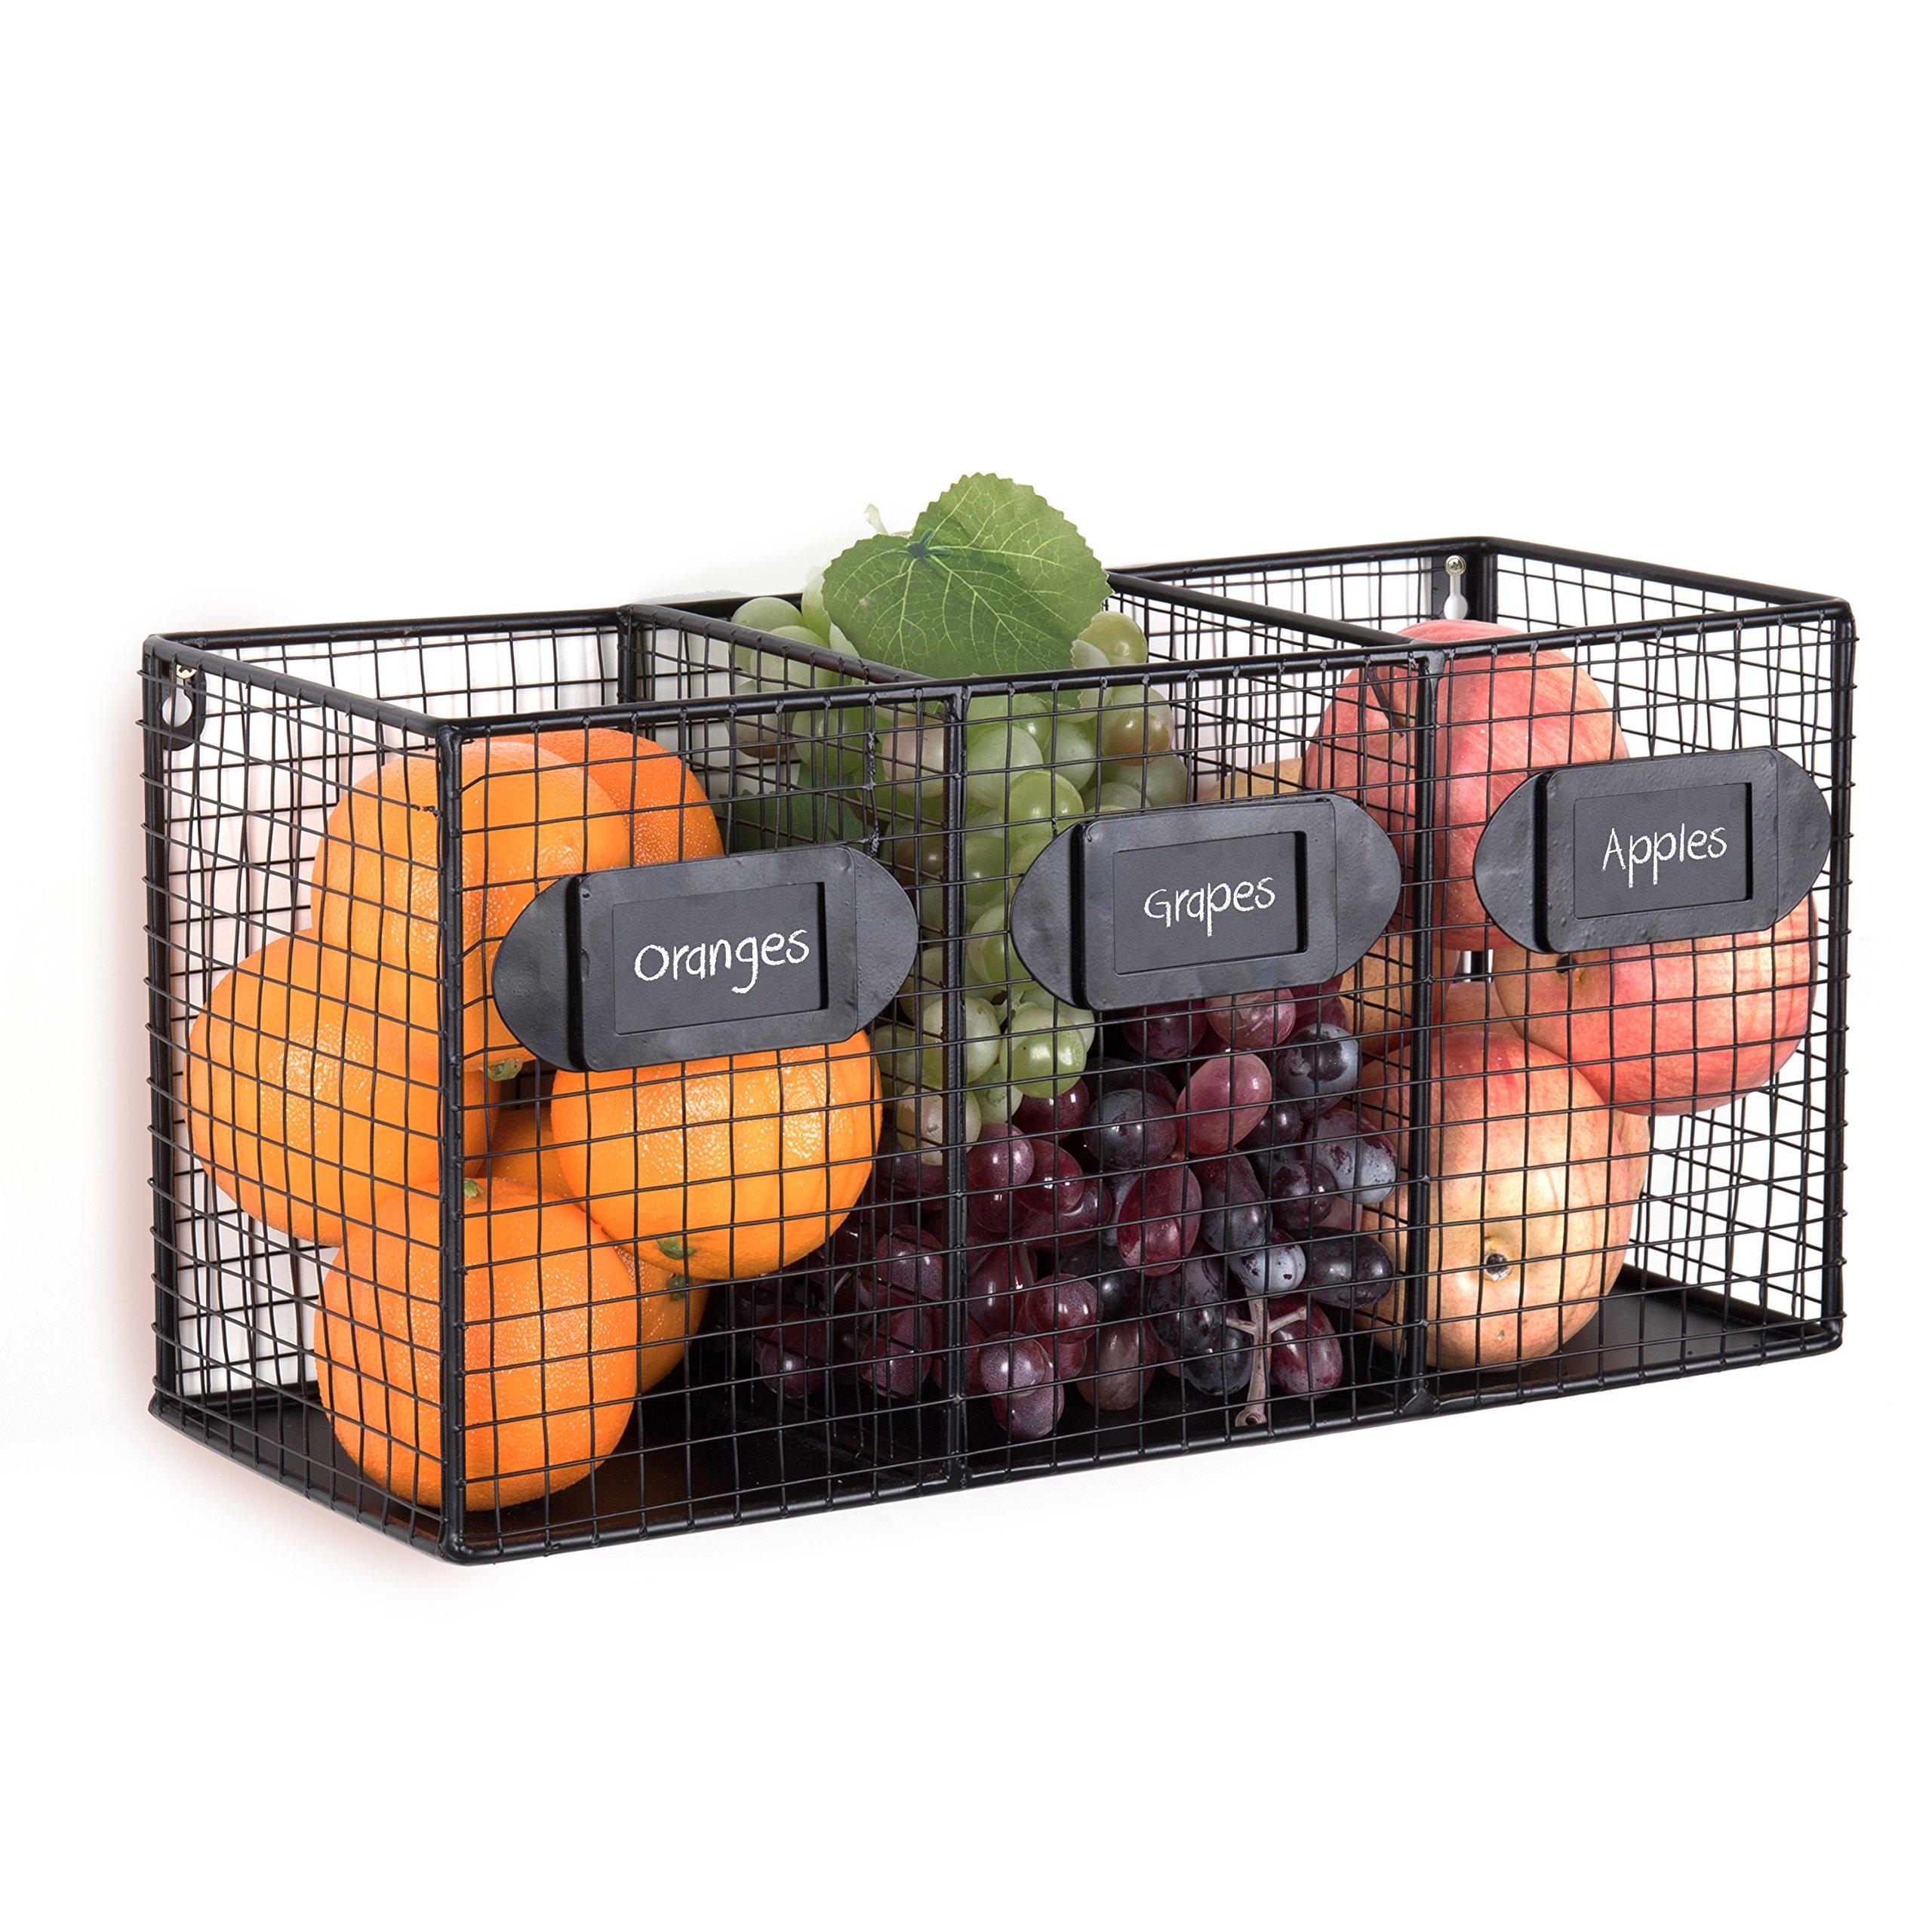 Wall Mounted Black Metal Wire 3 Bin Kitchen Pantry Organizer Basket, Mail Sorter w/Chalkboard Labels